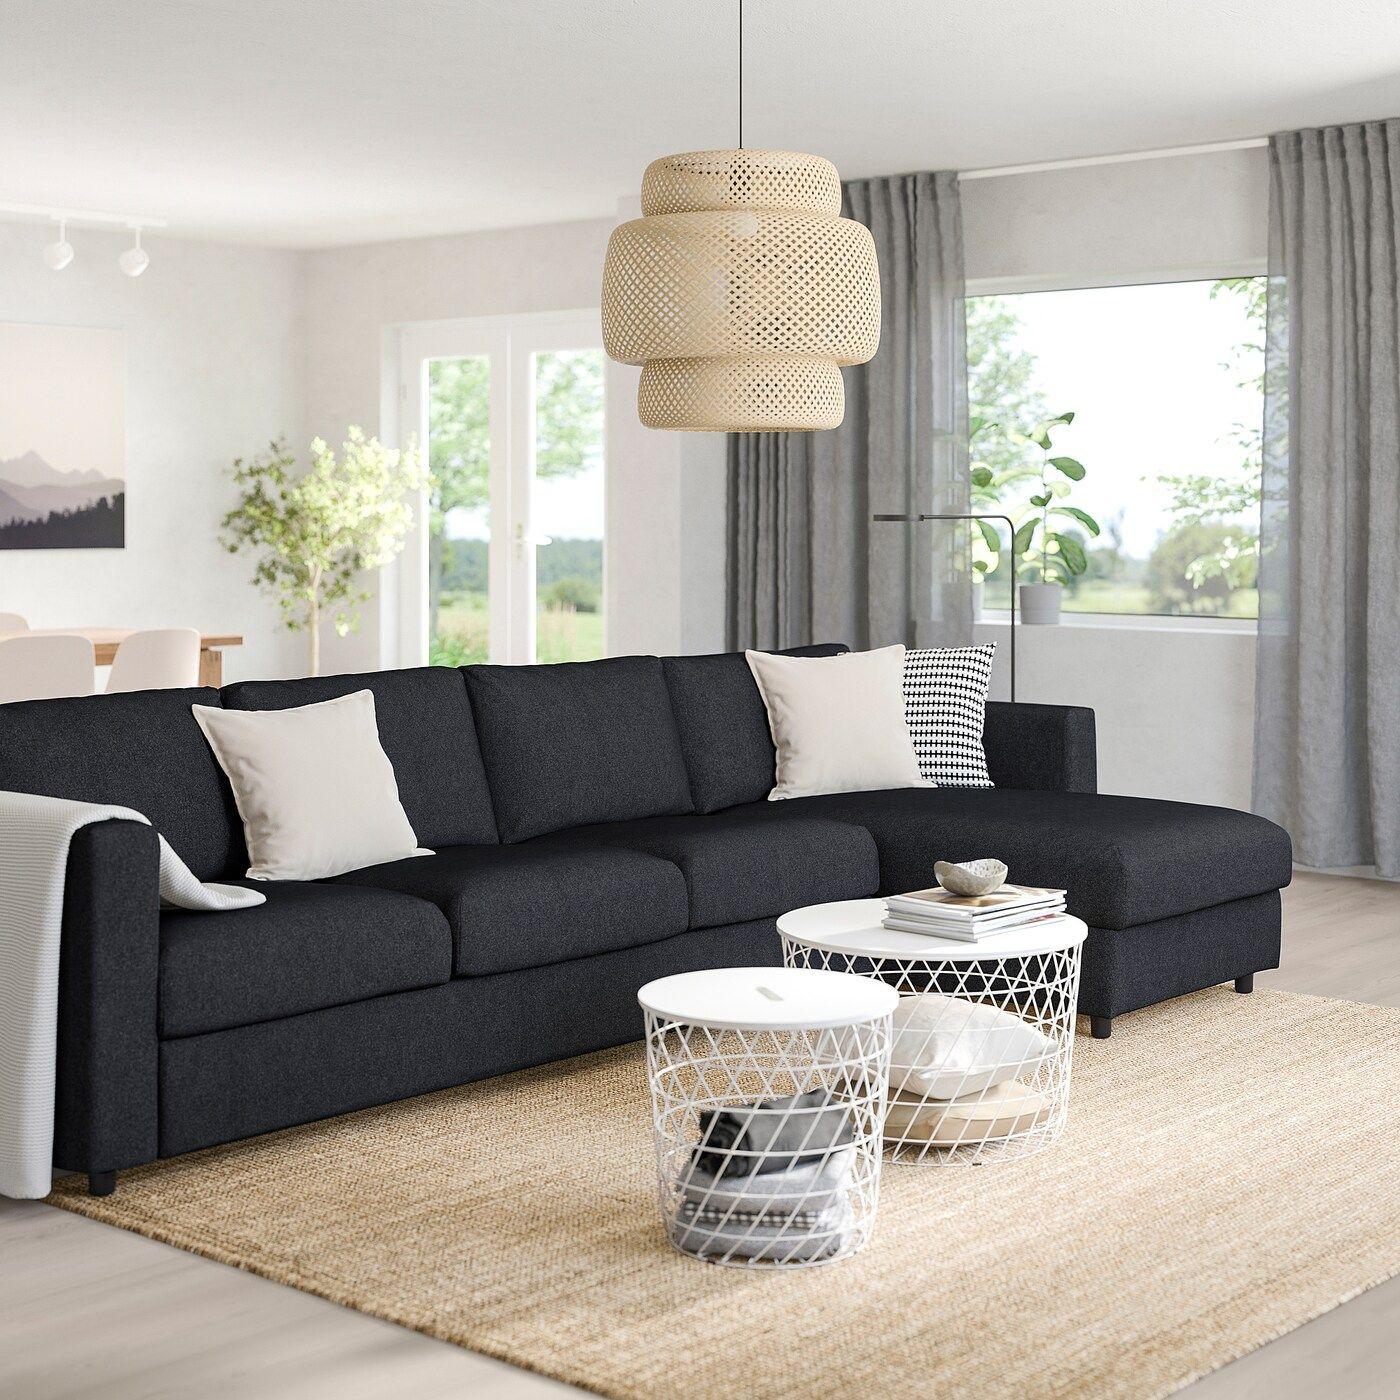 Vimle 4er Sofa Mit Recamiere Tallmyra Schwarz Grau Sitzecke Sofas Und Ecksofa